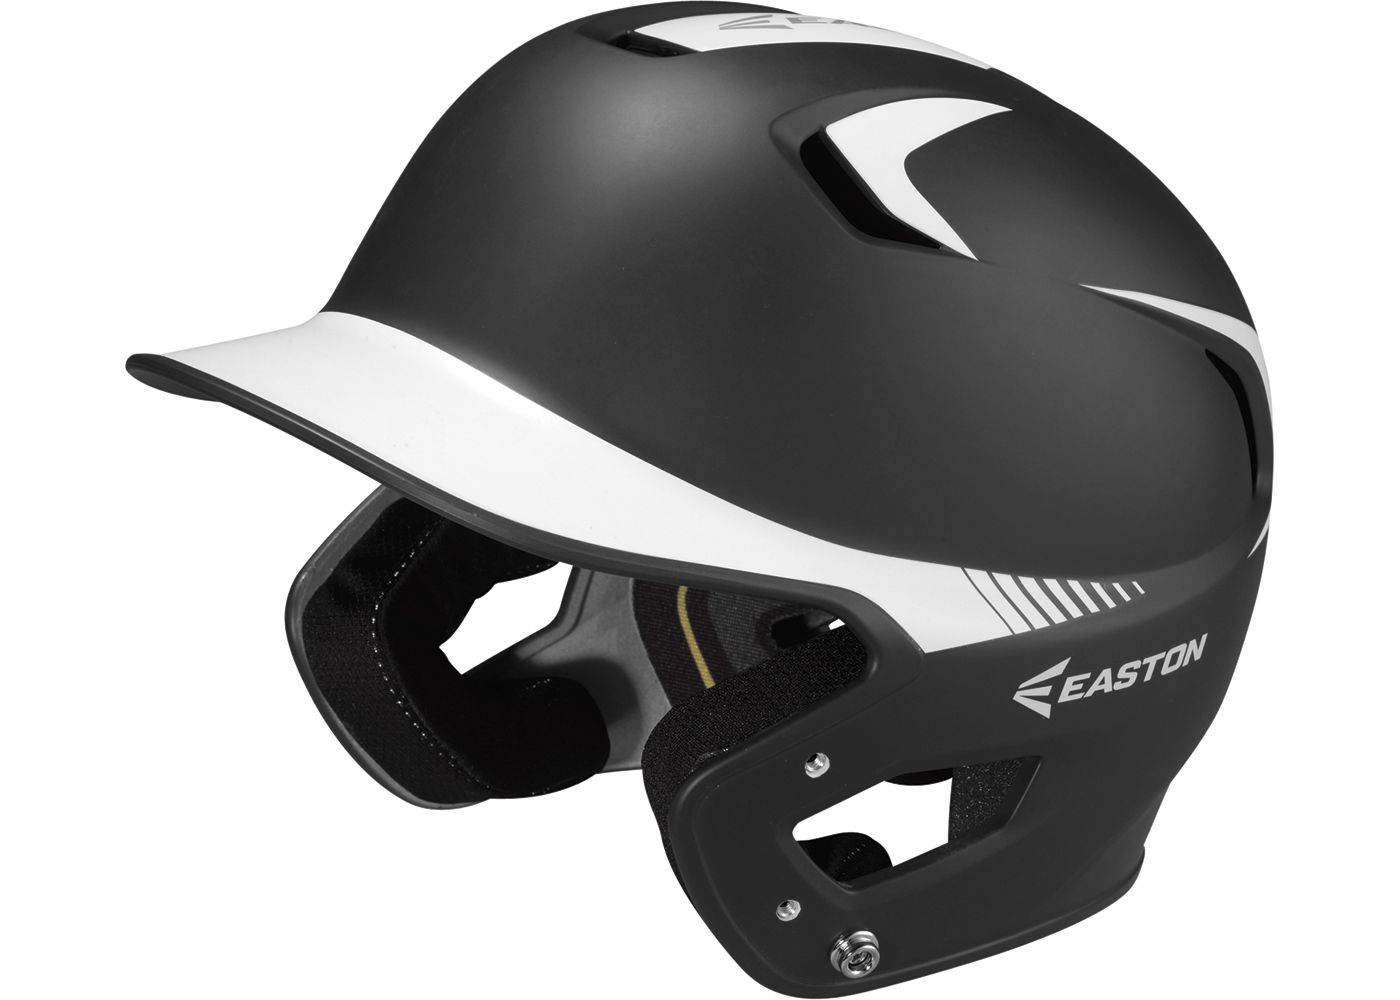 Easton Senior Z5 Grip Two-Tone Batting Helmet